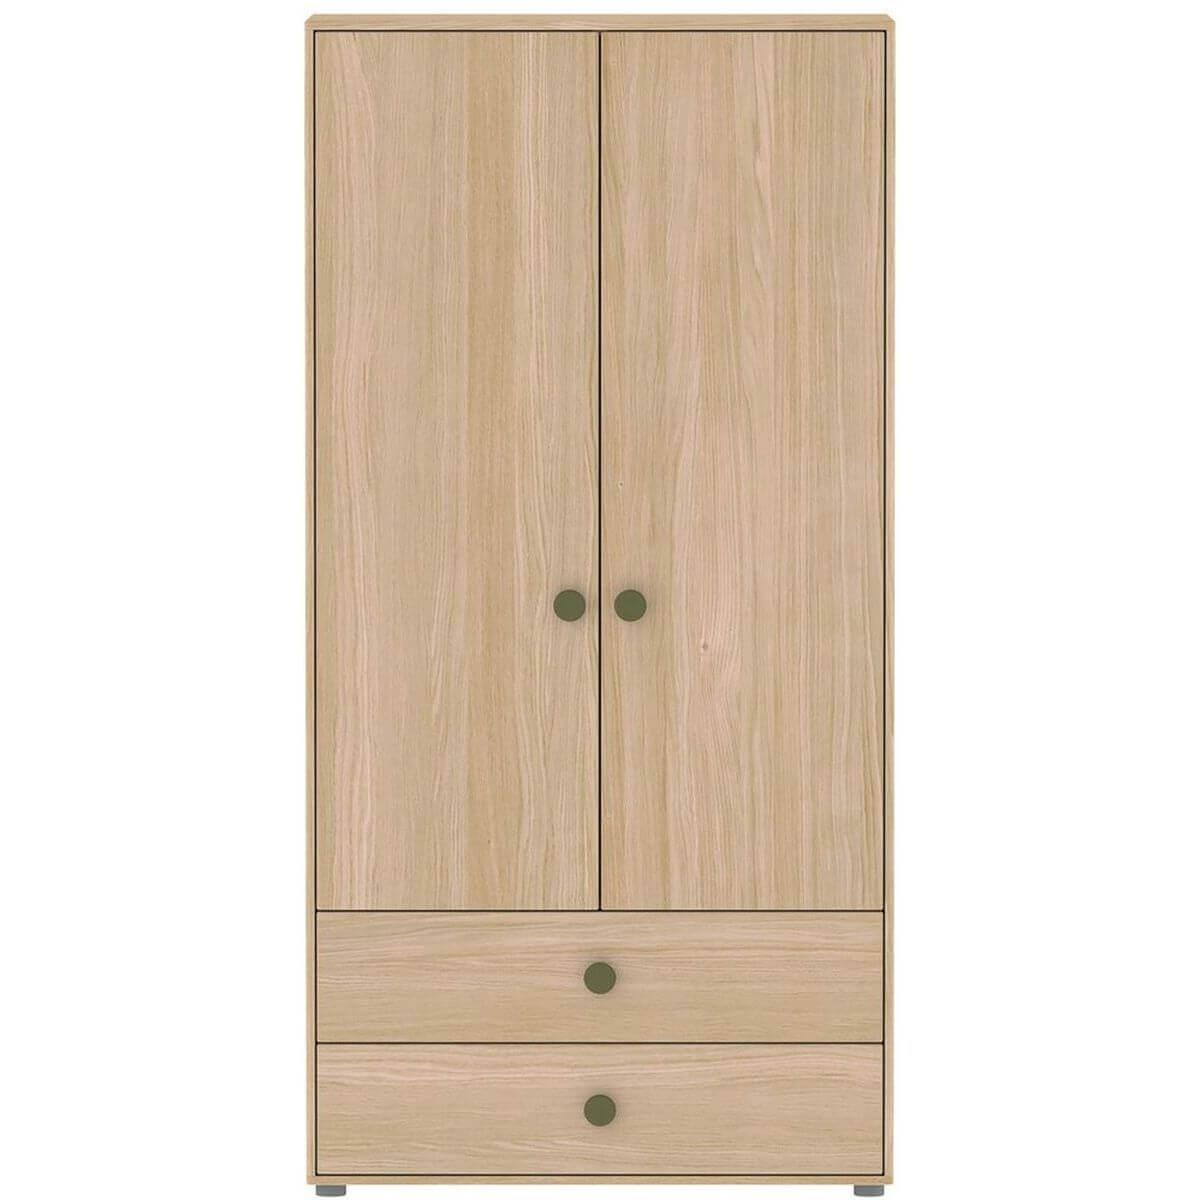 Kleiderschrank 2 Türen 202x101cm POPSICLE Flexa Eiche-kiwi